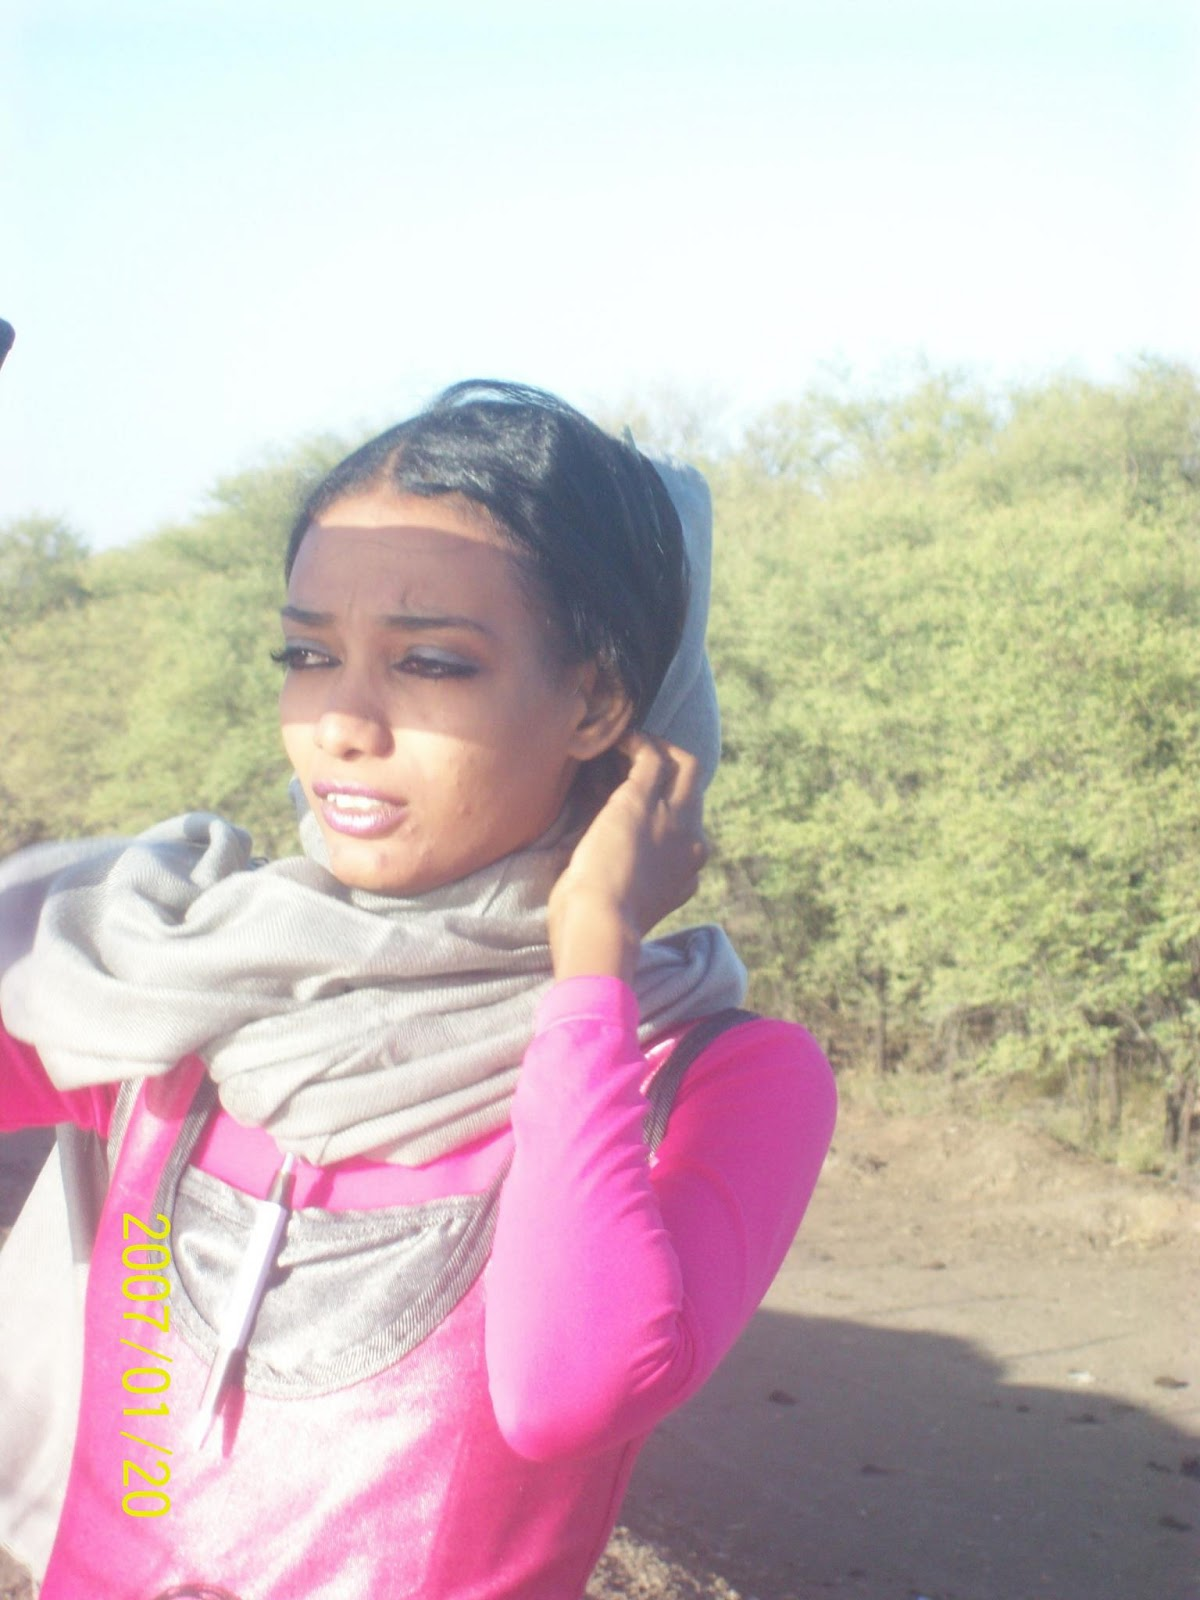 ab1e410c2 مجلة الطليعة الطلابية السودانيه القومية: يونيو 2013